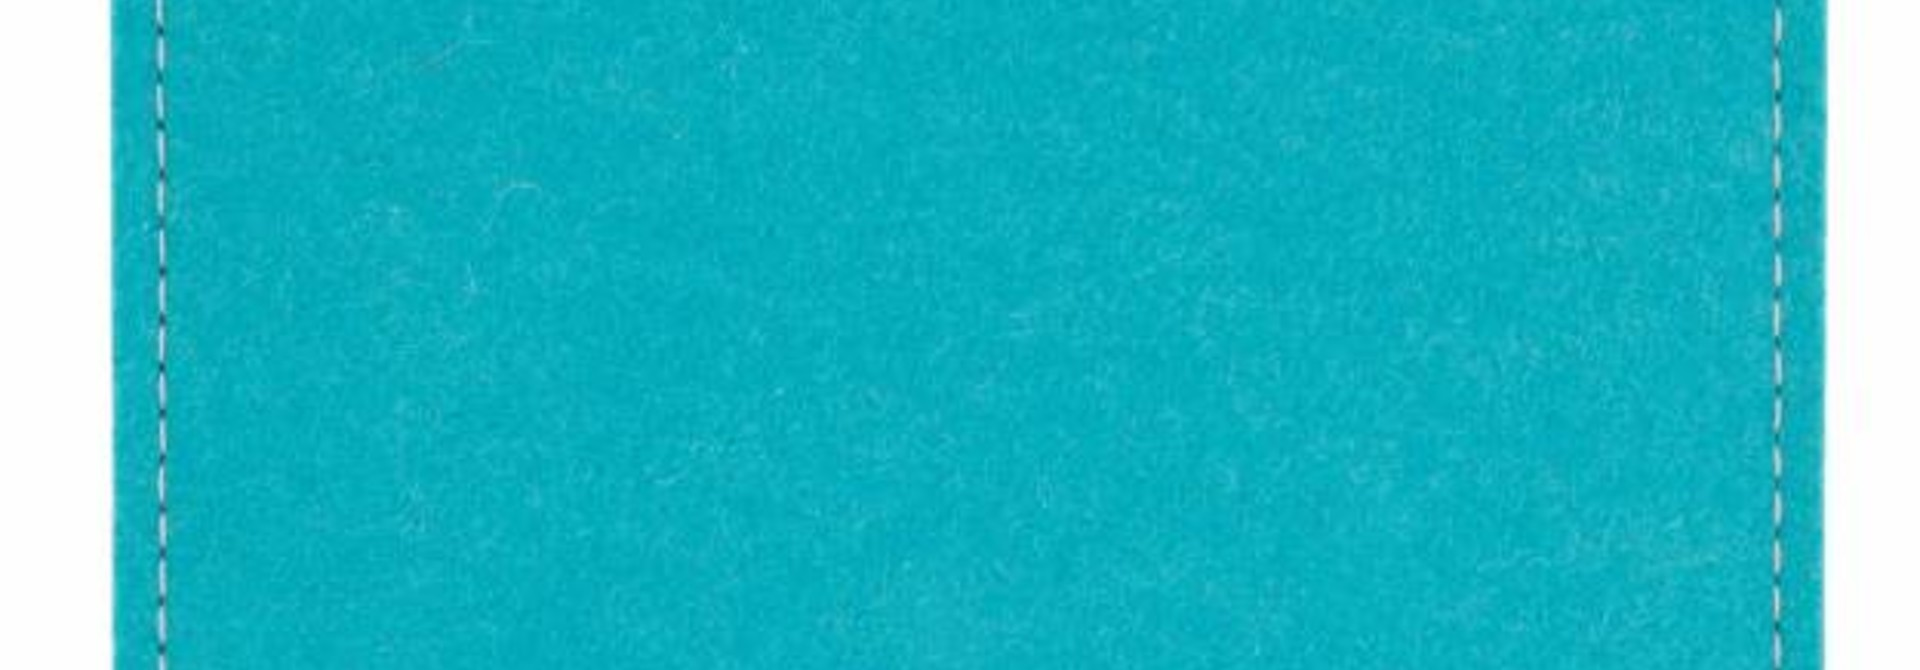 Tablet Sleeve Türkis